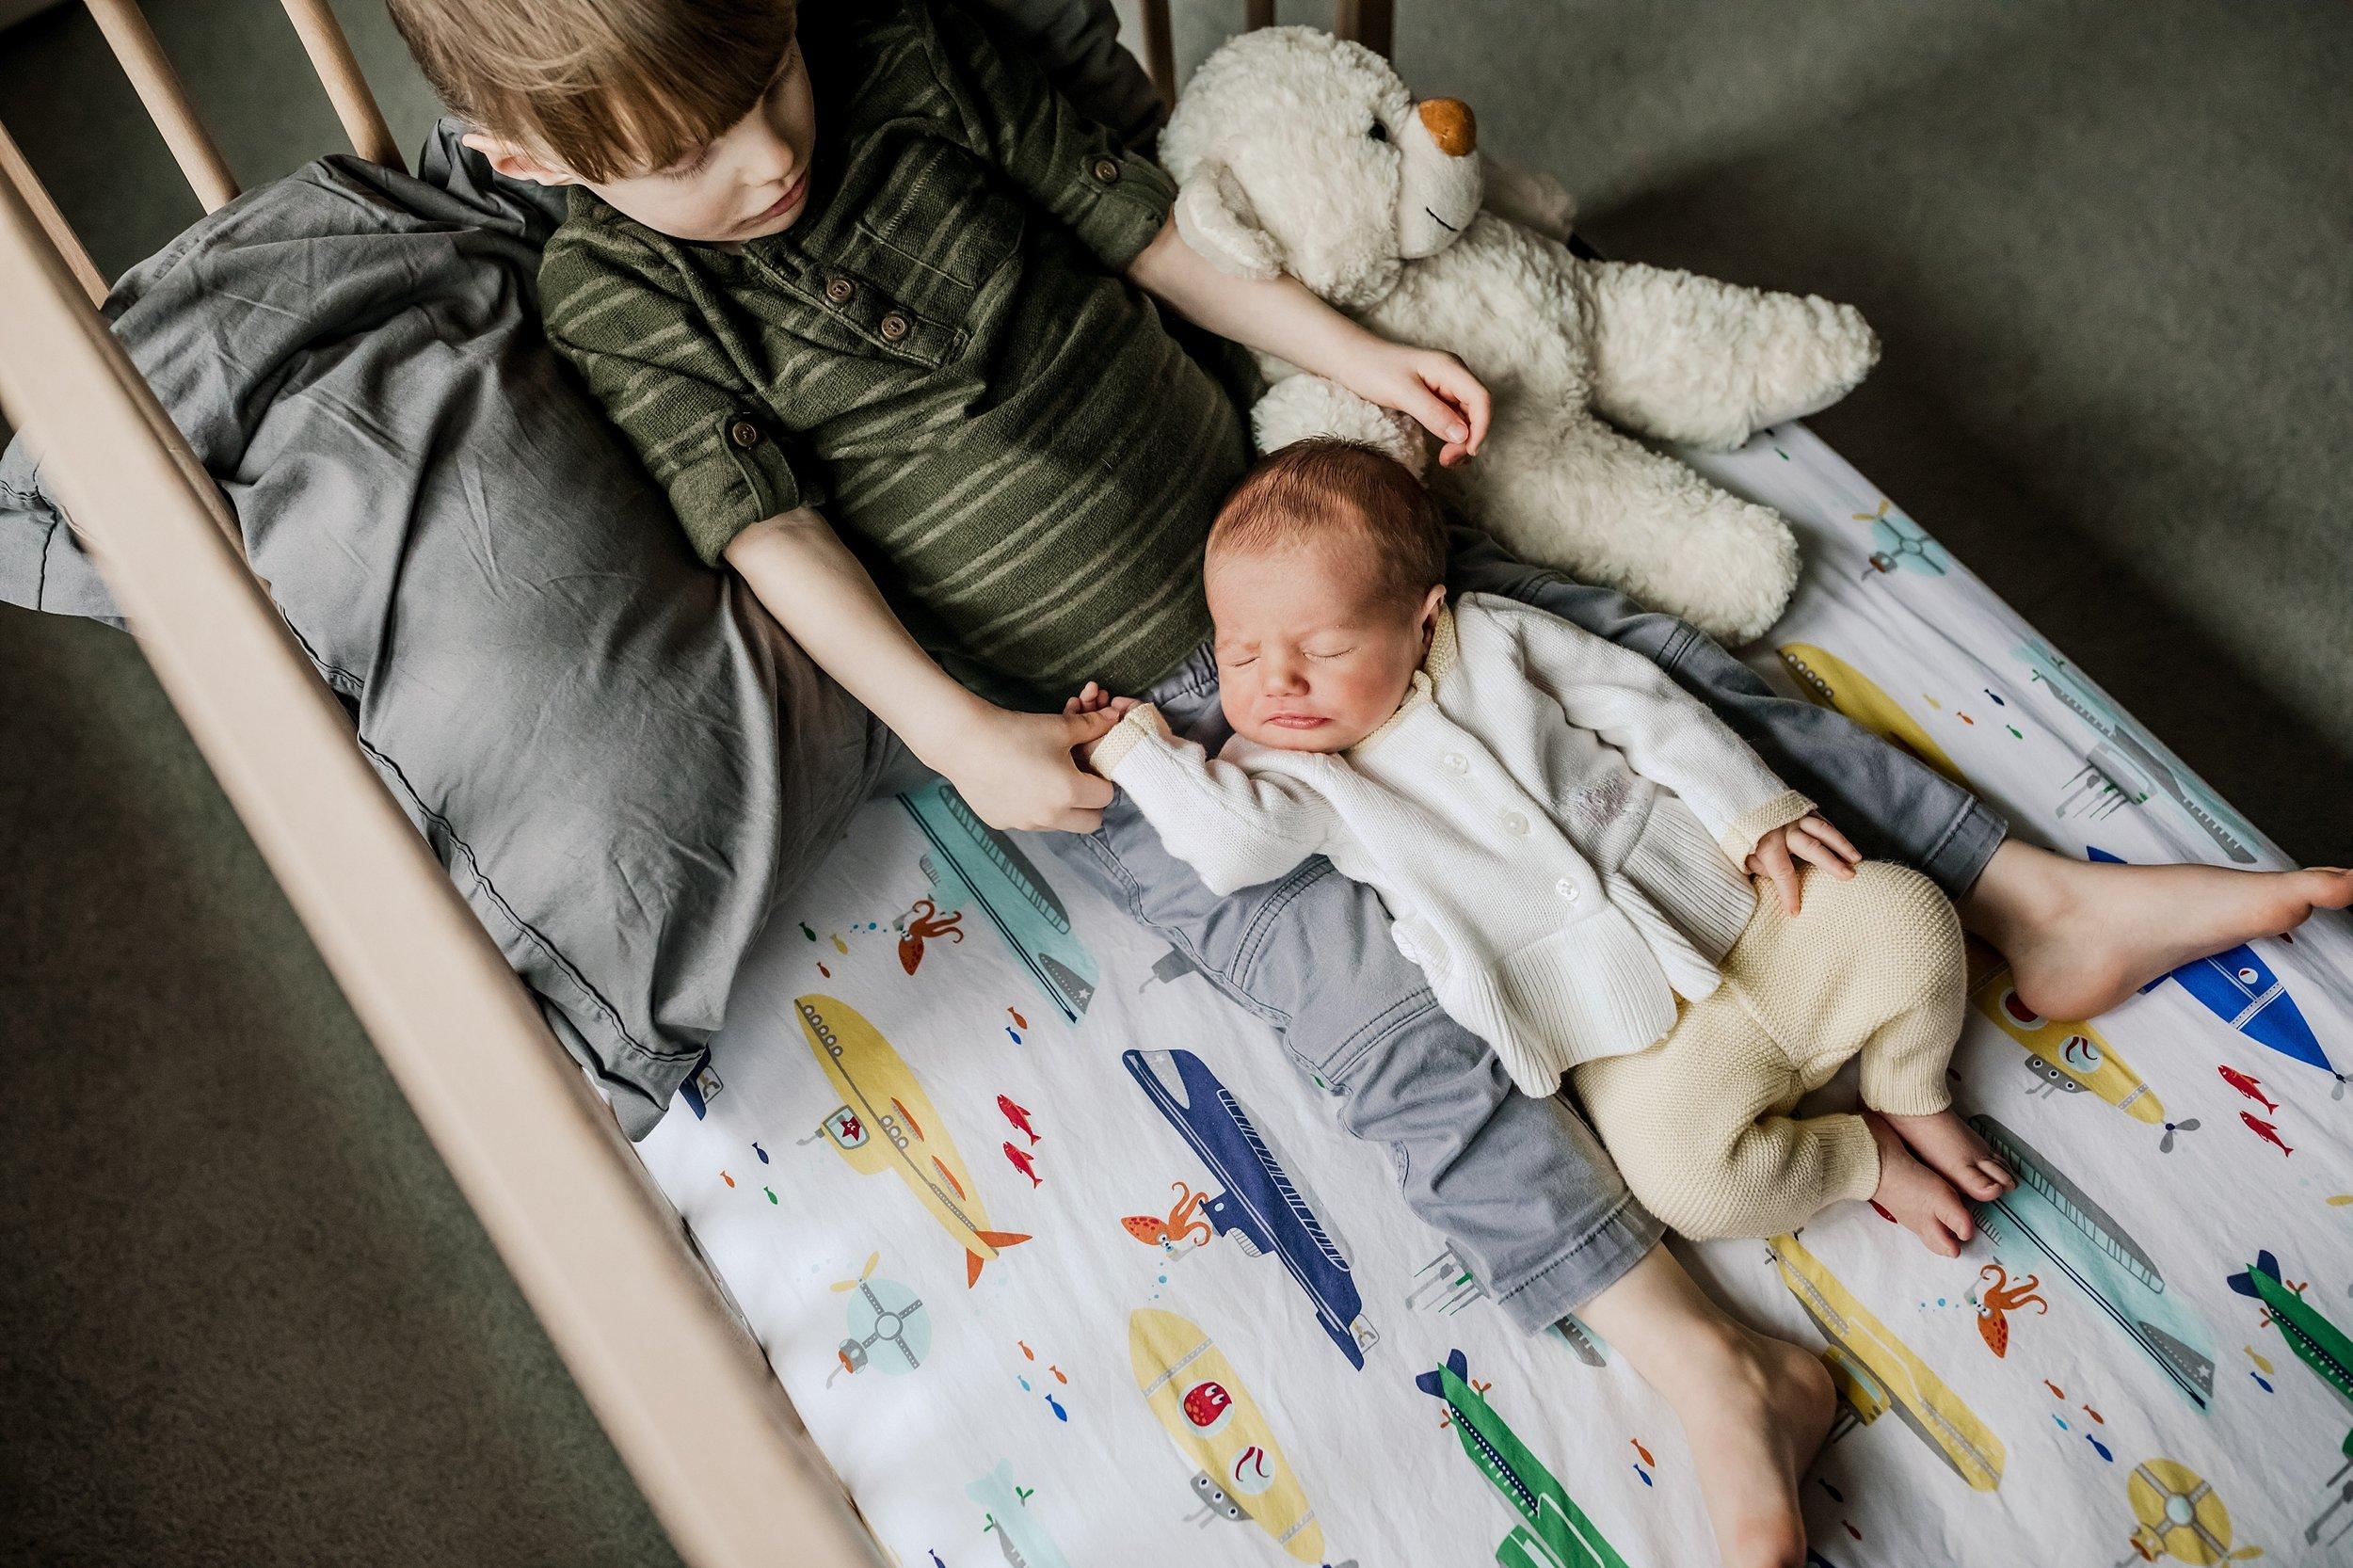 Lehigh-Valley-Newborn-Documentary-Photographer_0020.jpg